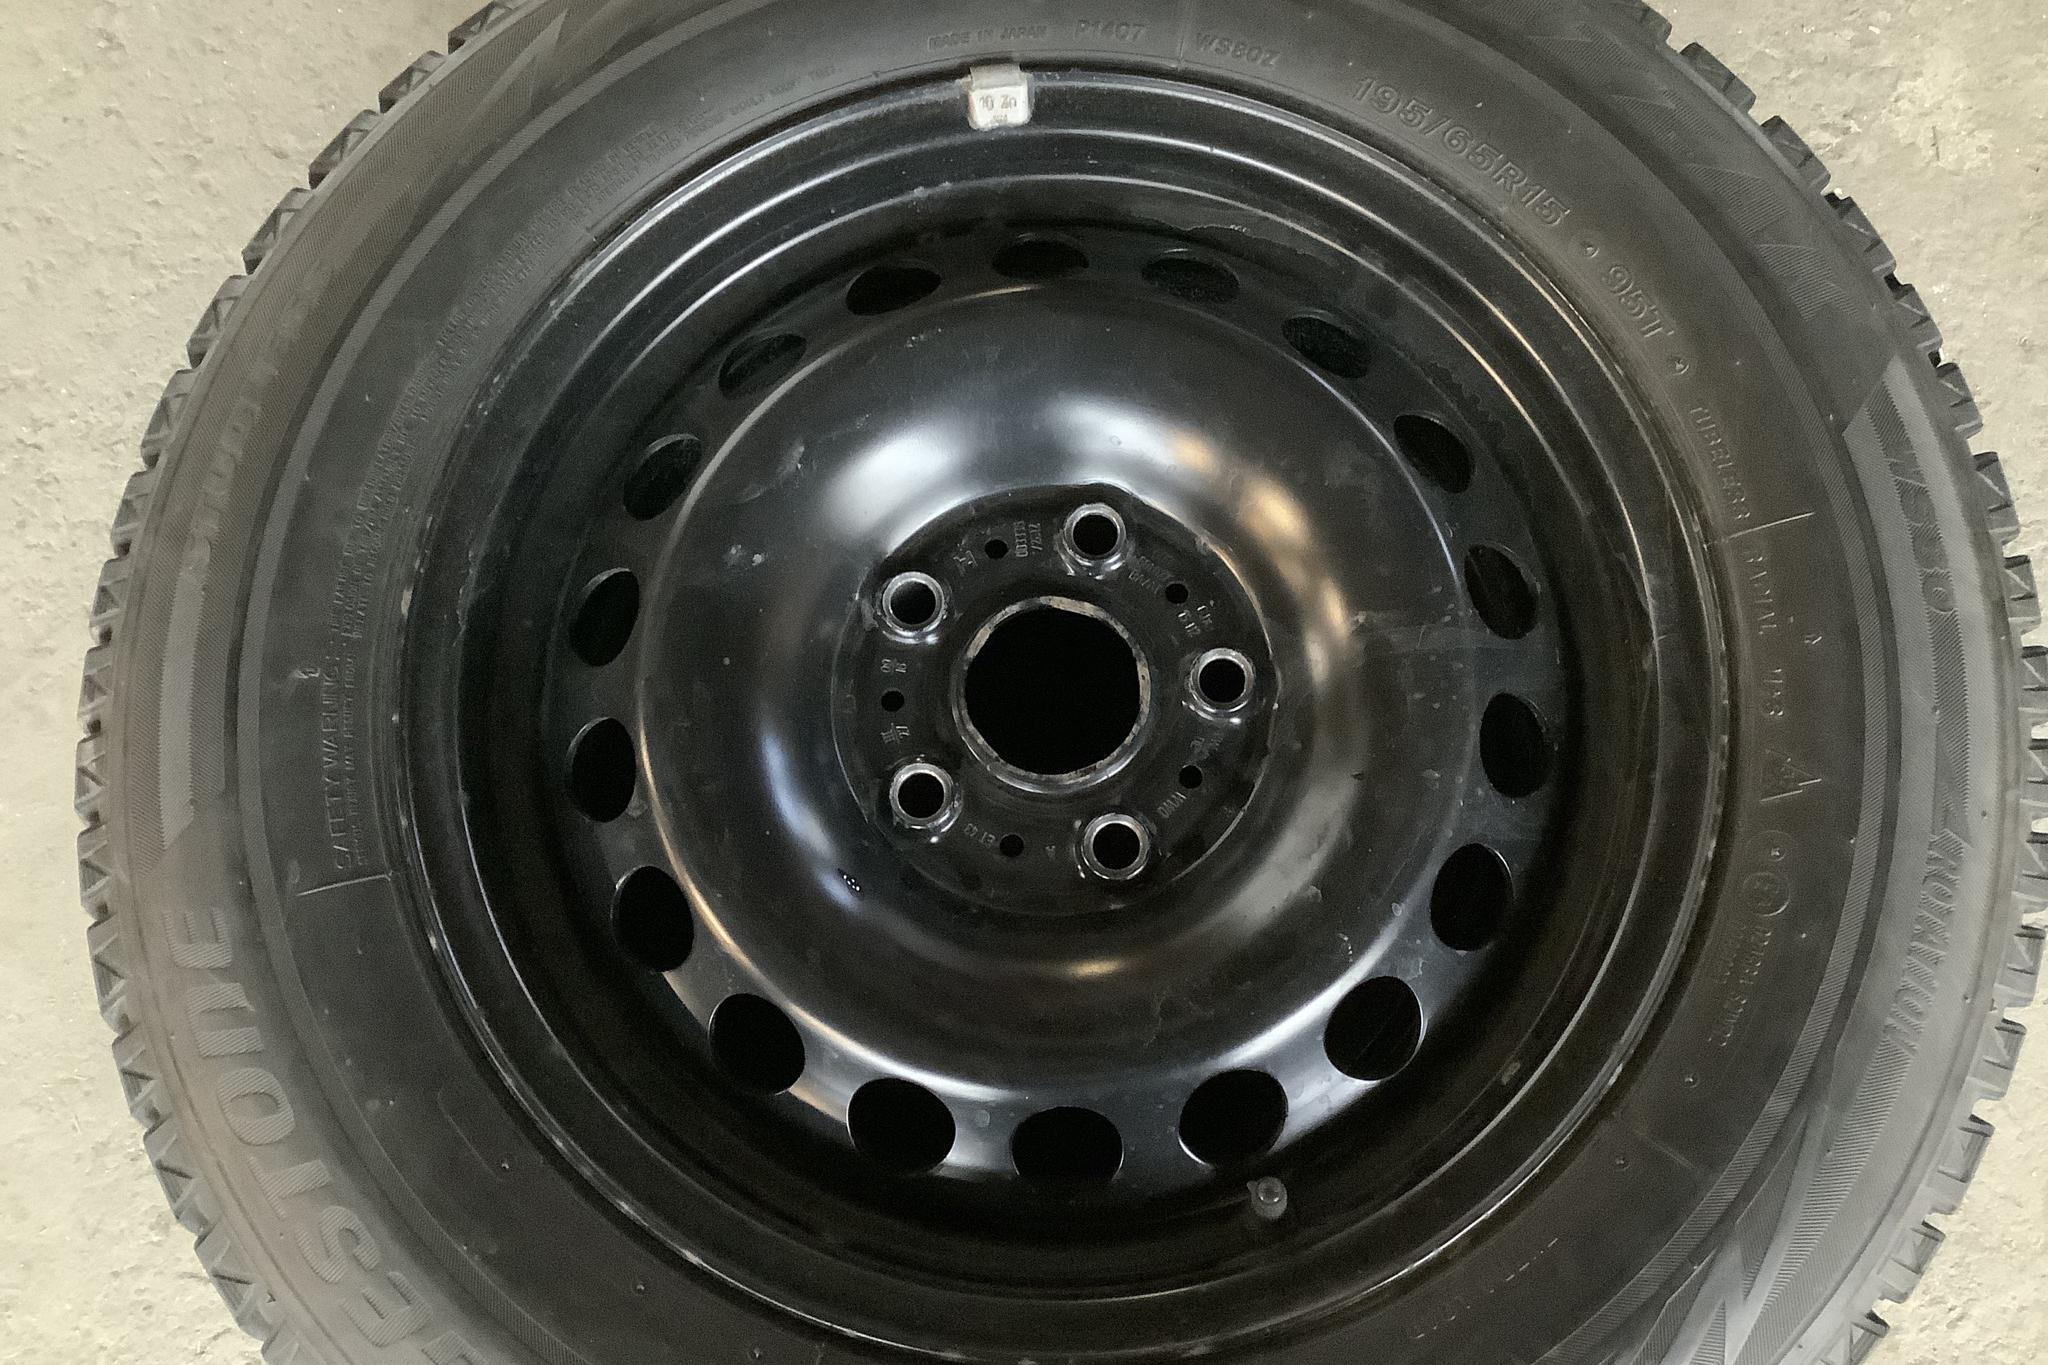 VW Golf VII 1.4 TSI Multifuel 5dr (125hk) - 2 794 mil - Manuell - röd - 2017